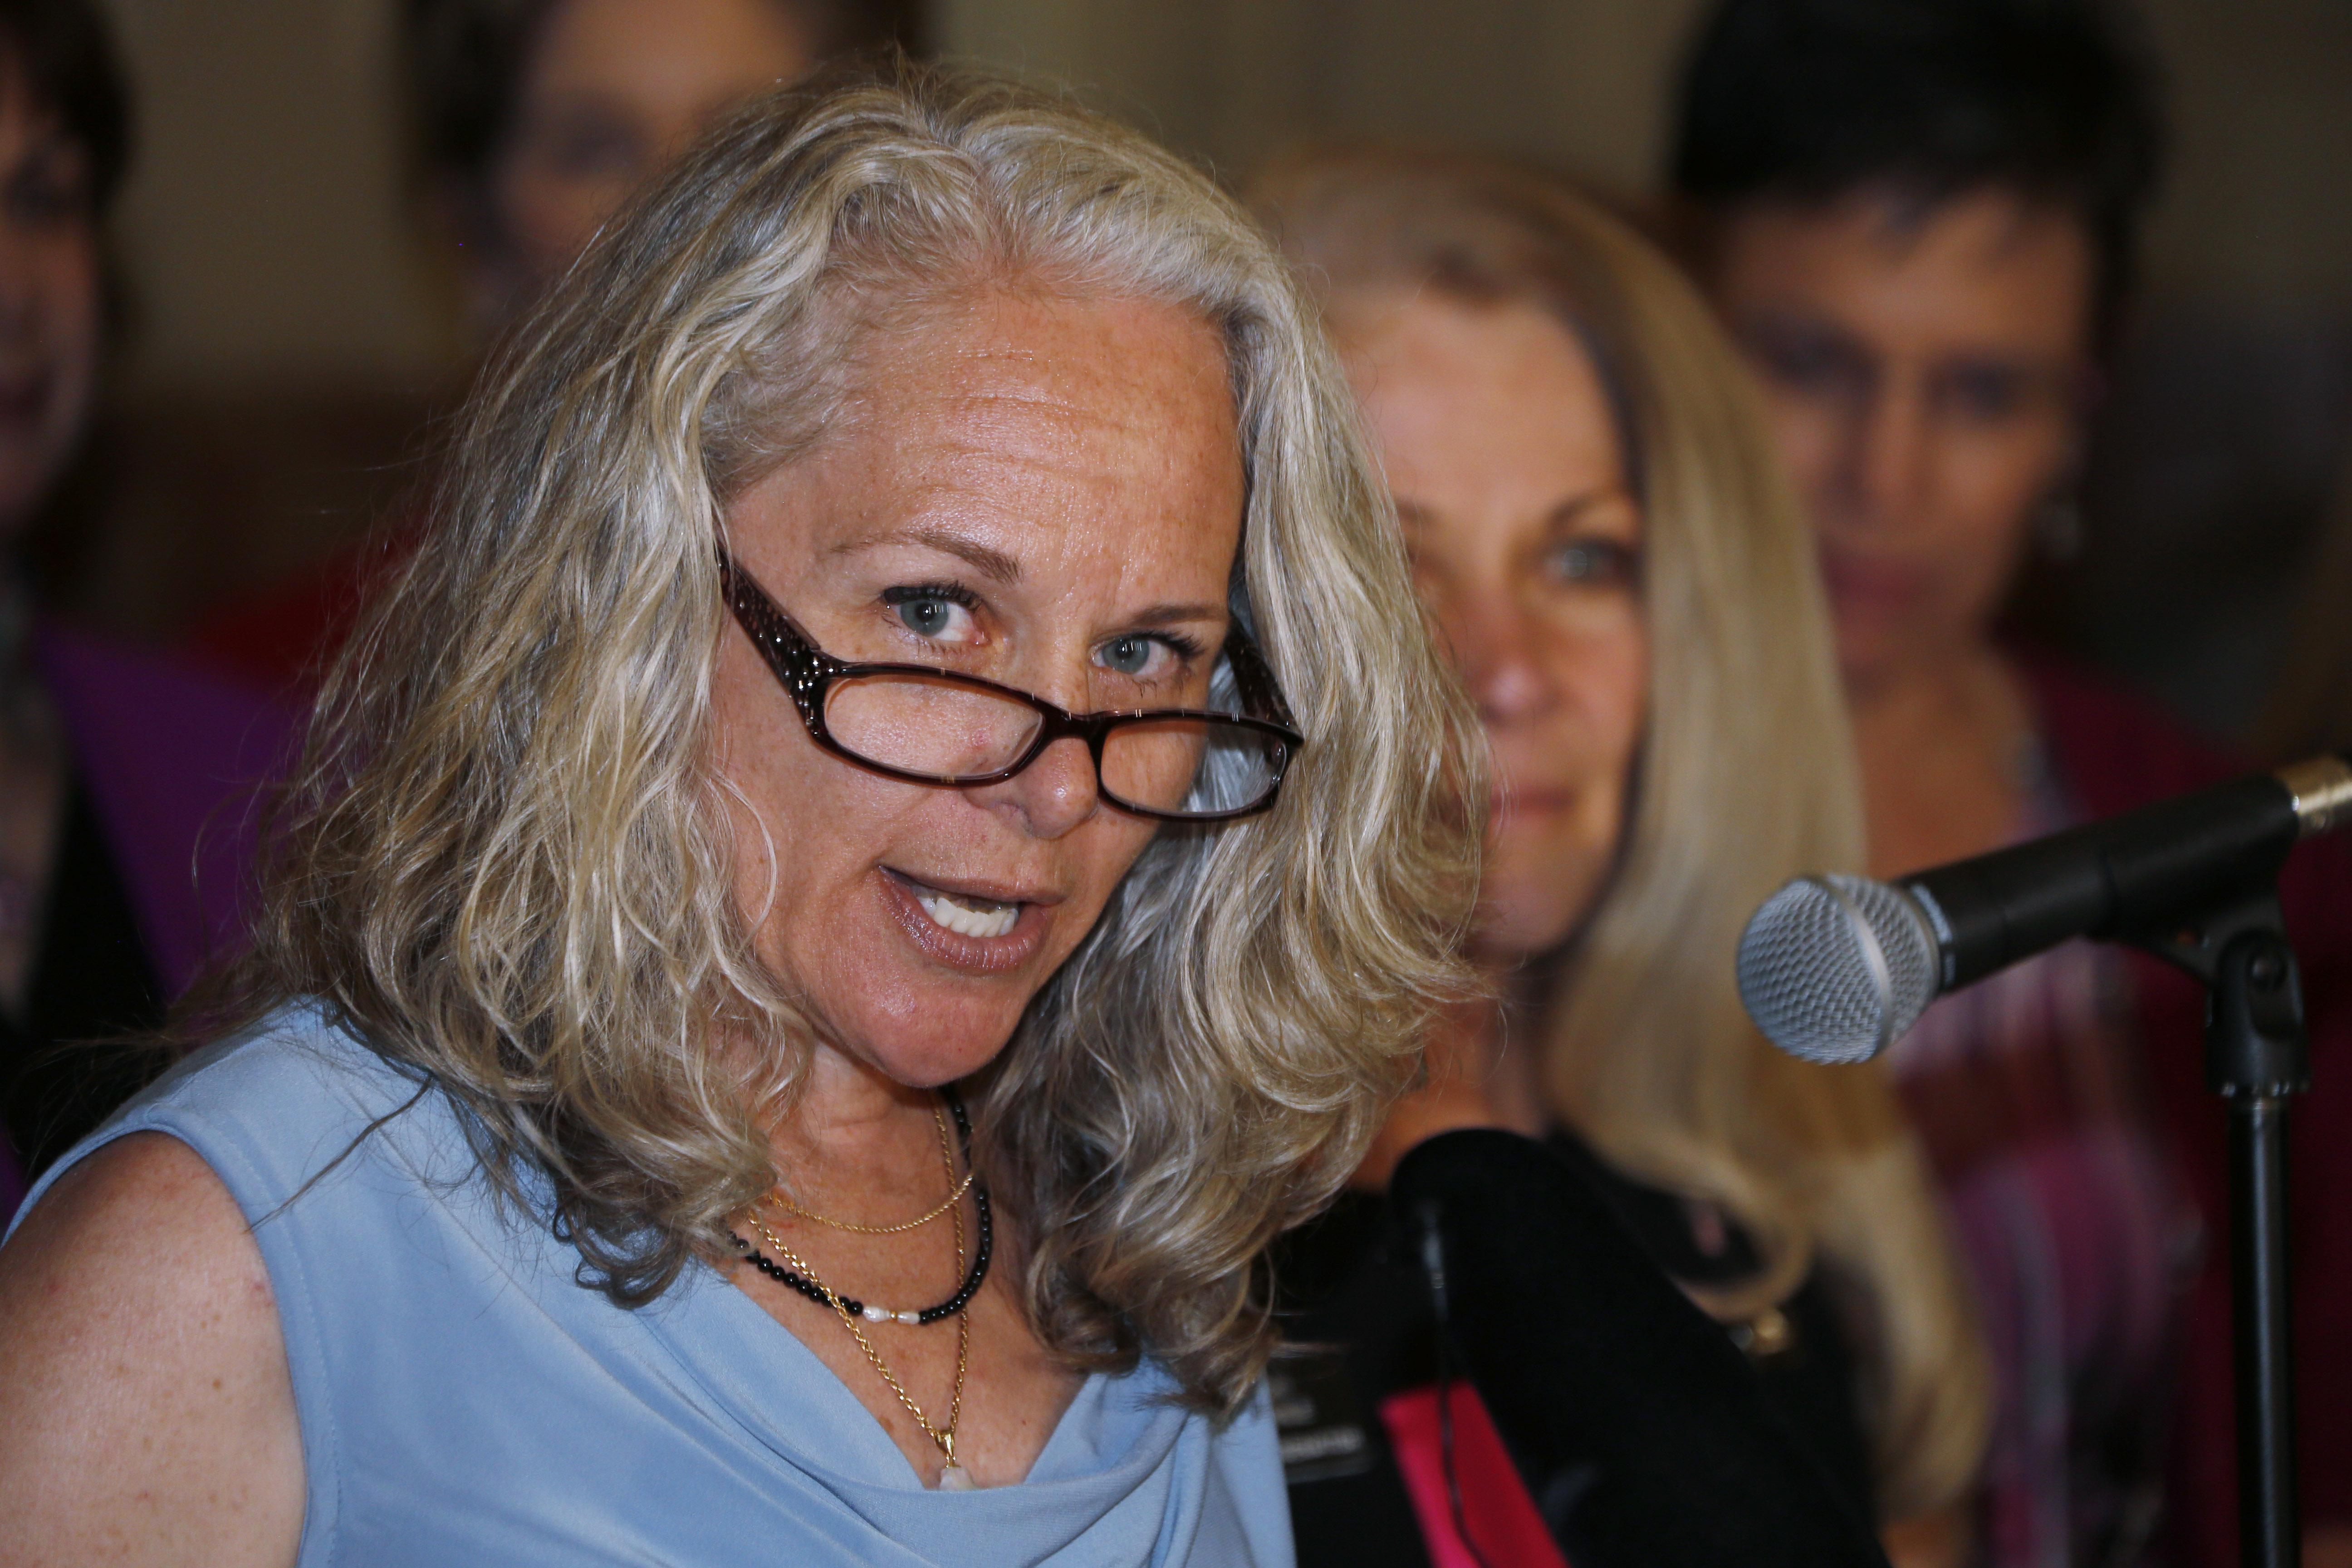 Photo: Colorado Springs mother speaks on public school testing (AP Photo)